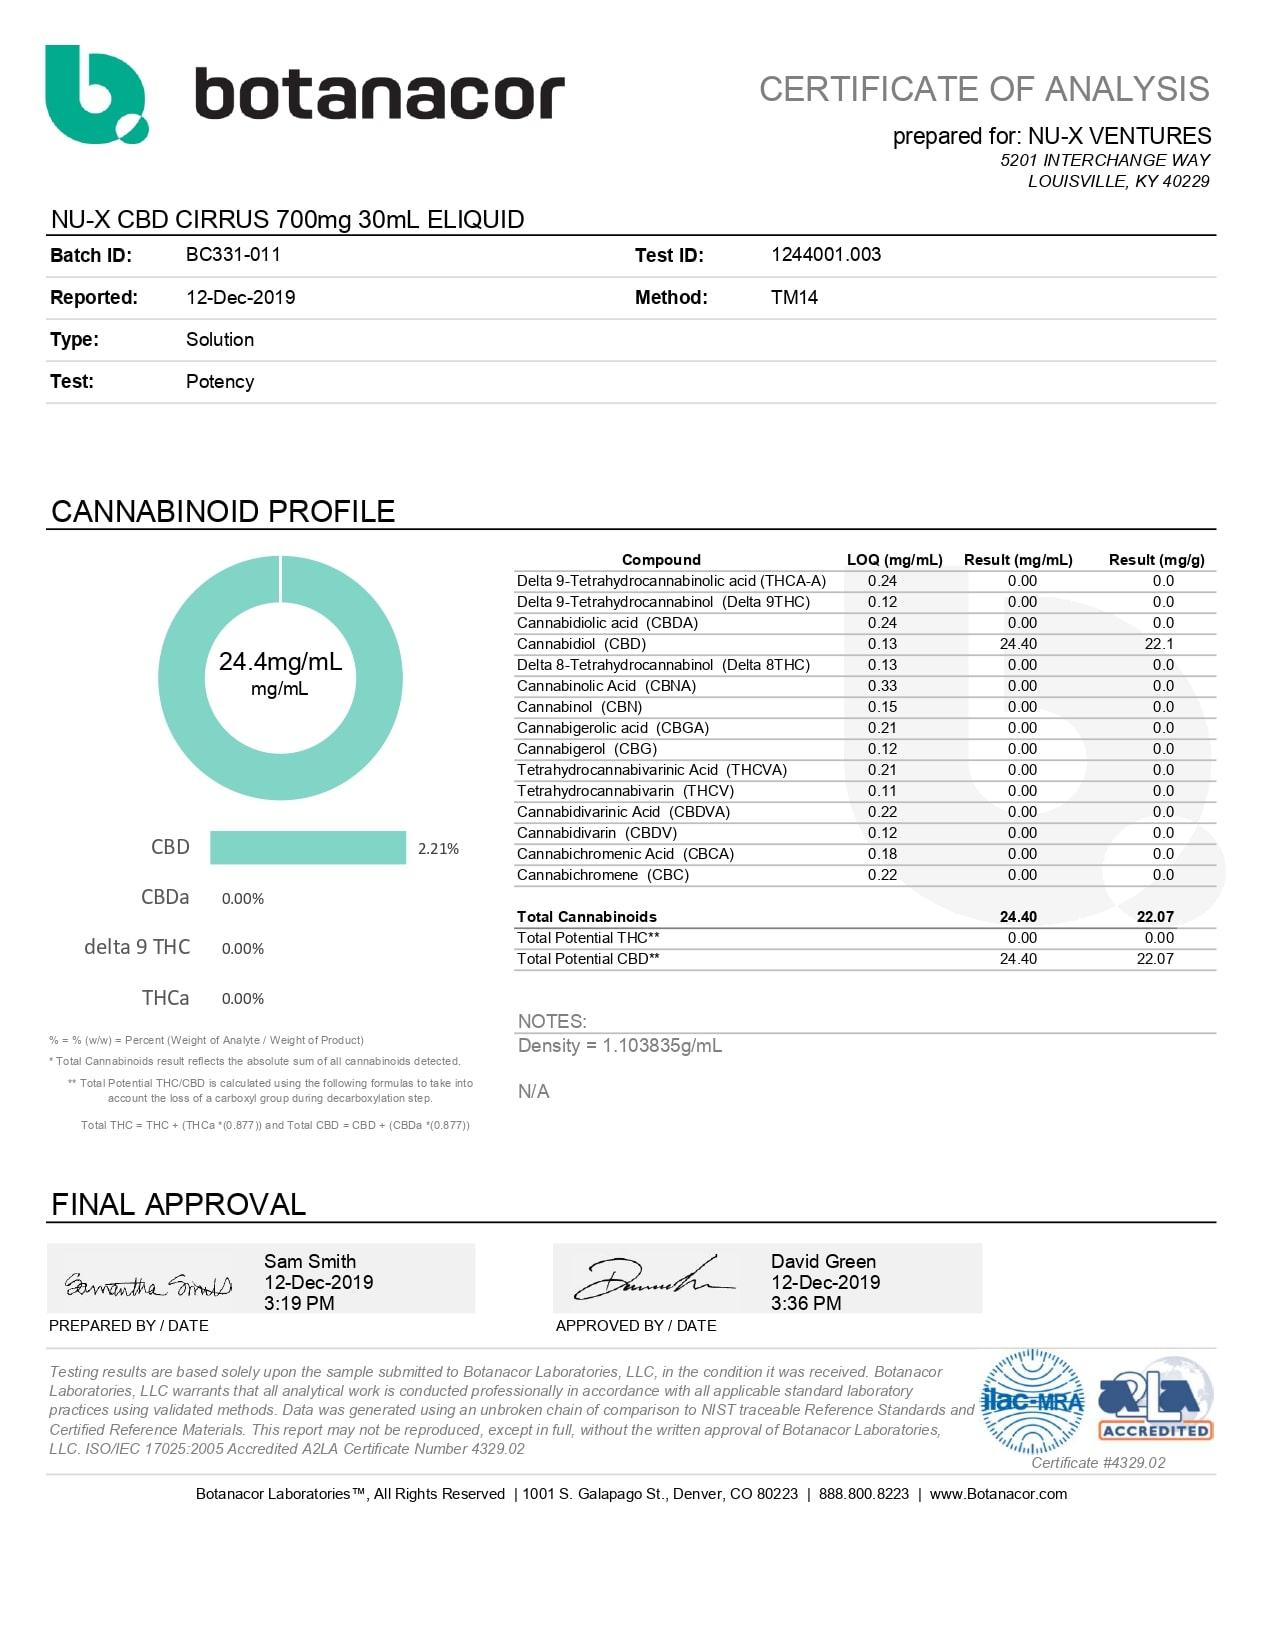 NU-X CBD eLiquid Strawberry French Toast - Cirrus Lab Report 700mg